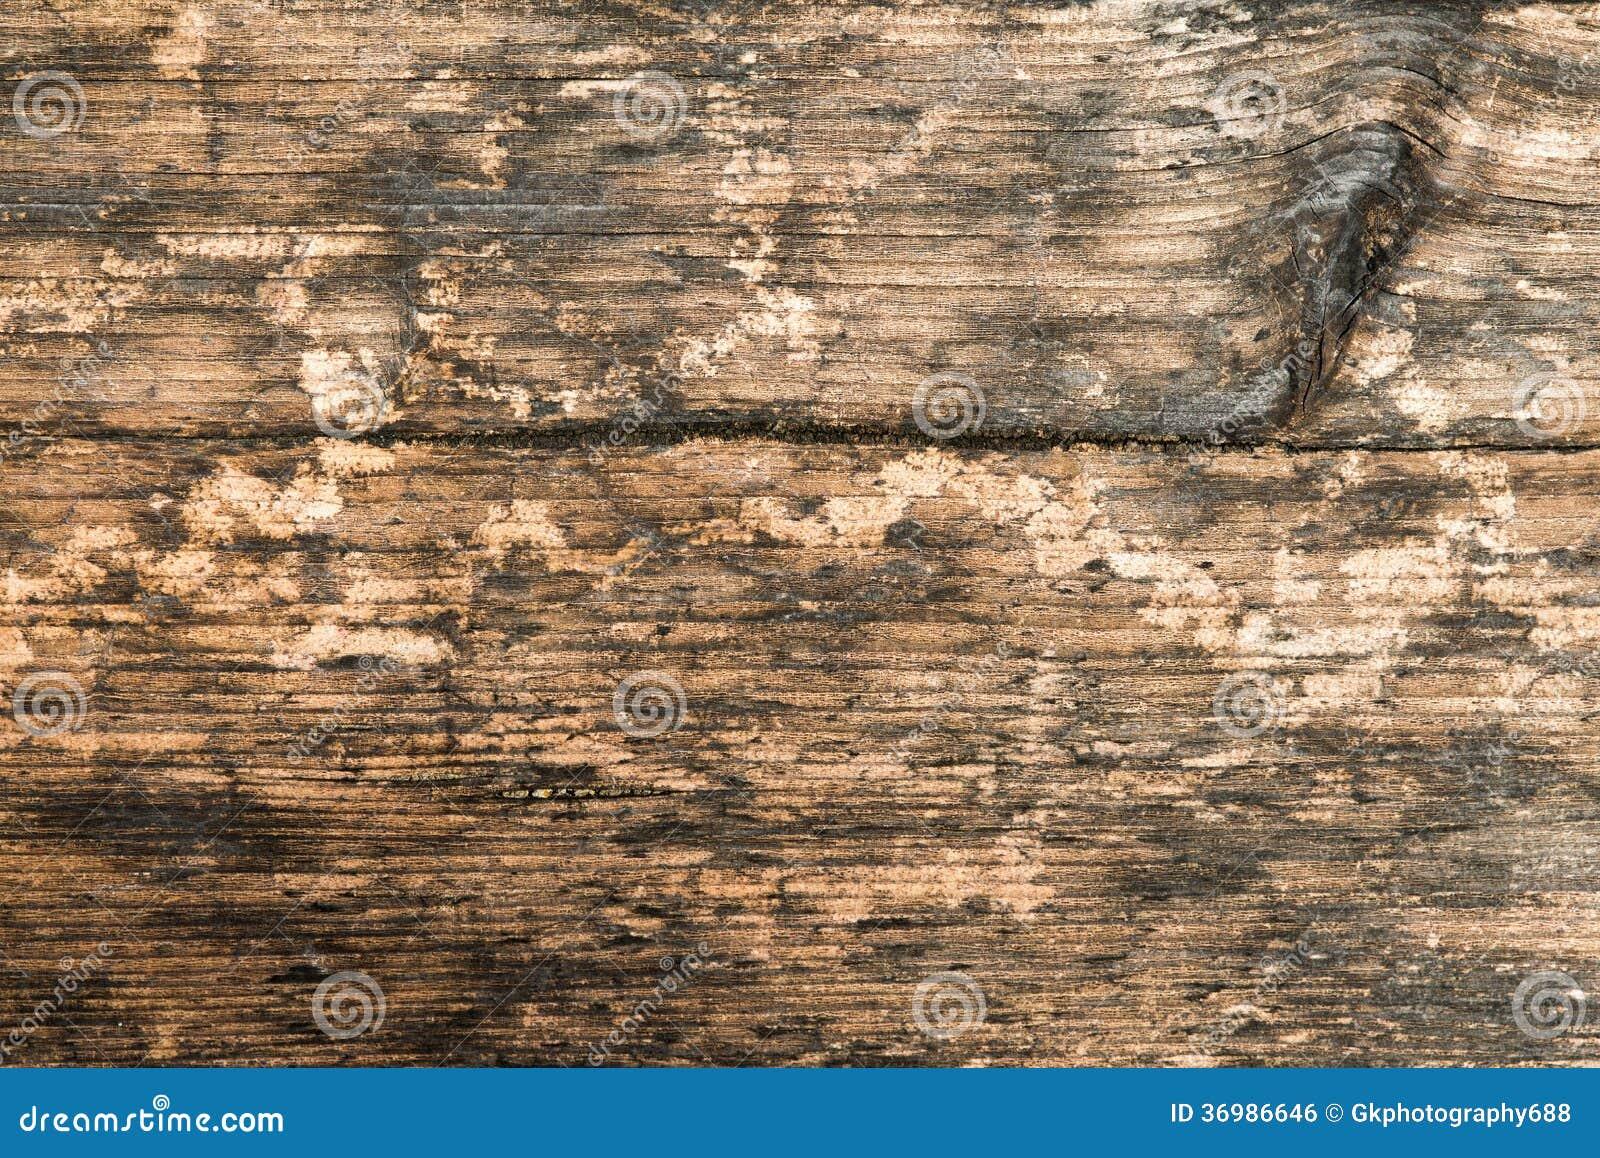 grain close up wallpaper - photo #31